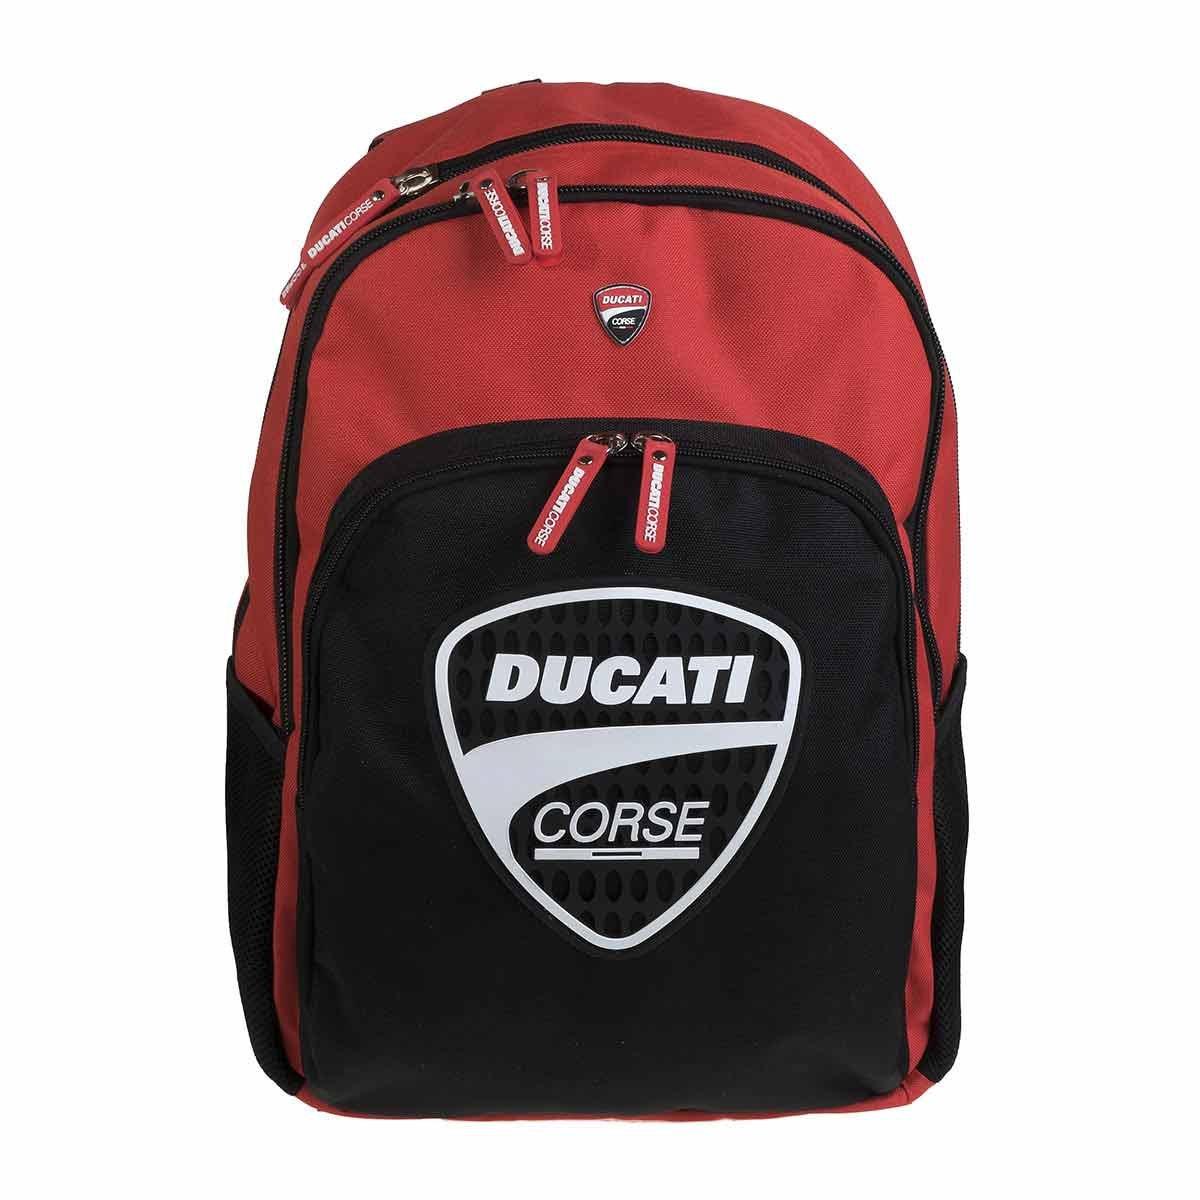 Busquets Carpeta Gomas Ducati by DIS2